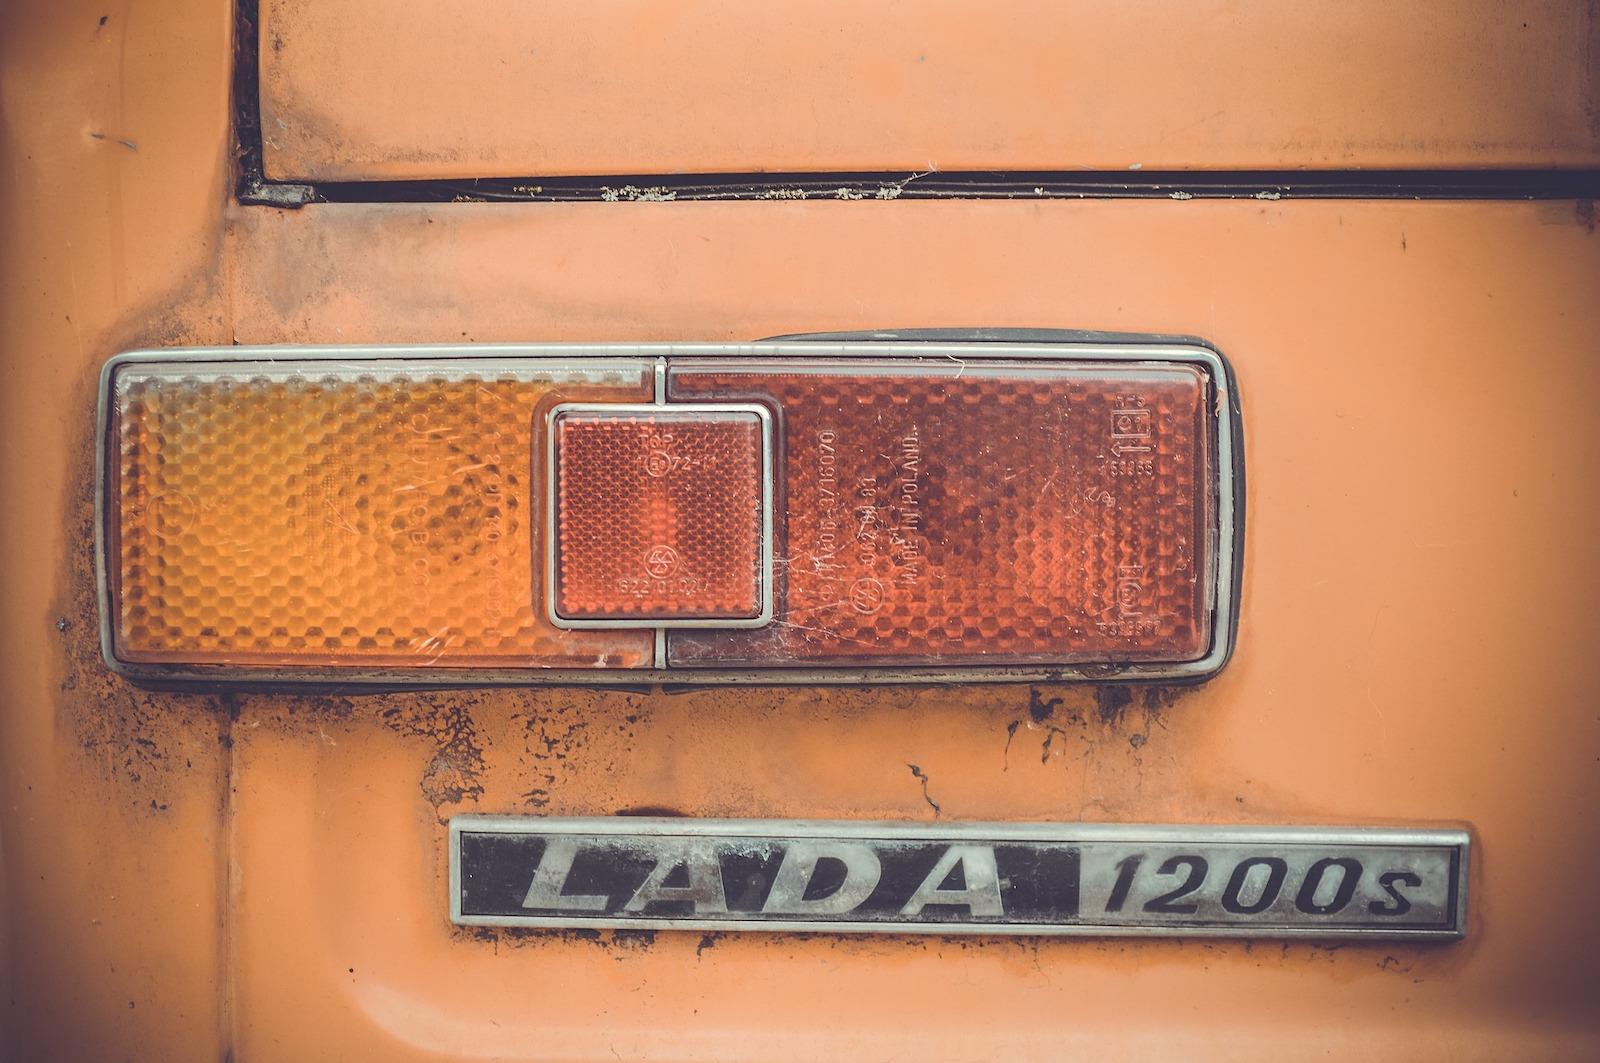 Lada 1200S merkki